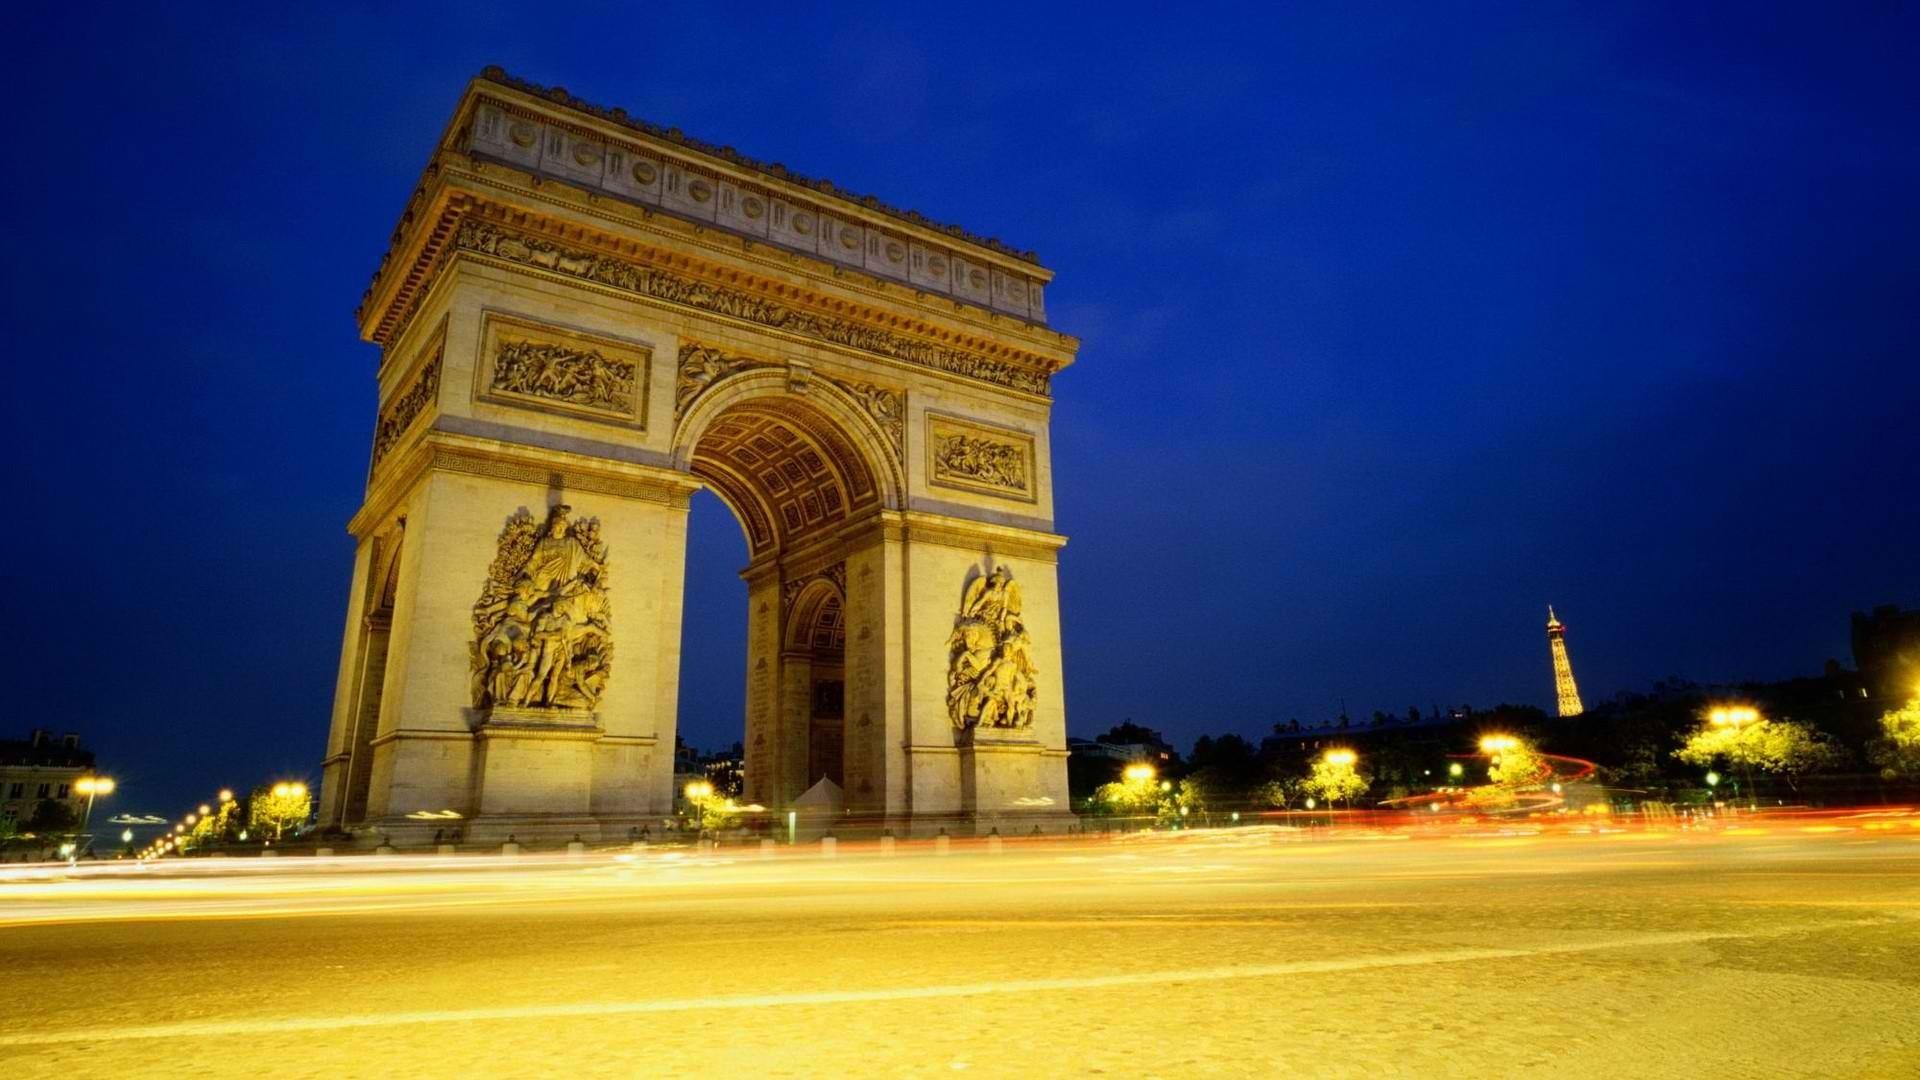 Arc De Triomphe wallpaper for pc